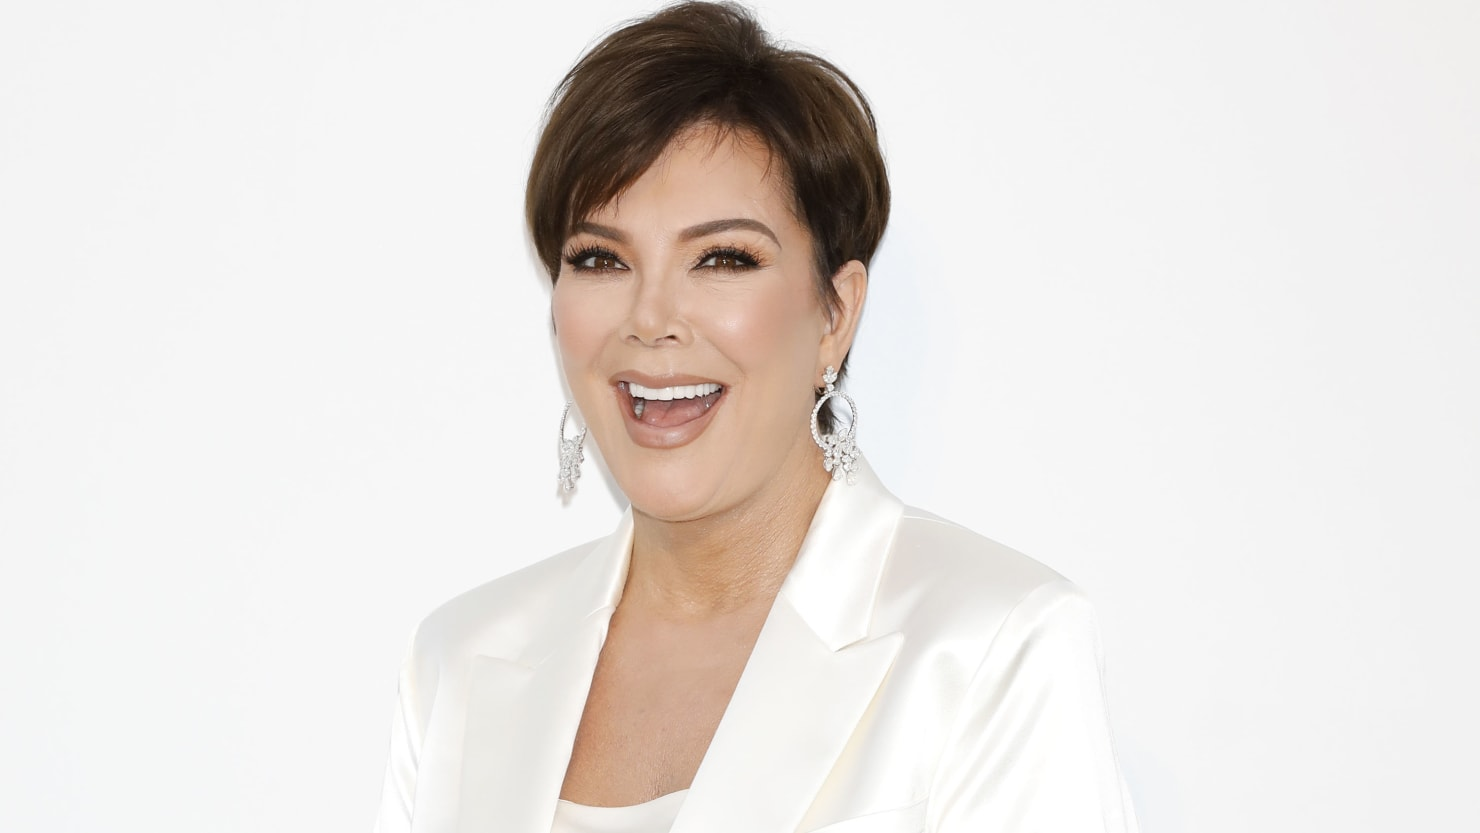 Can Kris Jenner Go From Kardashian'Momager' to Make-Up Guru?